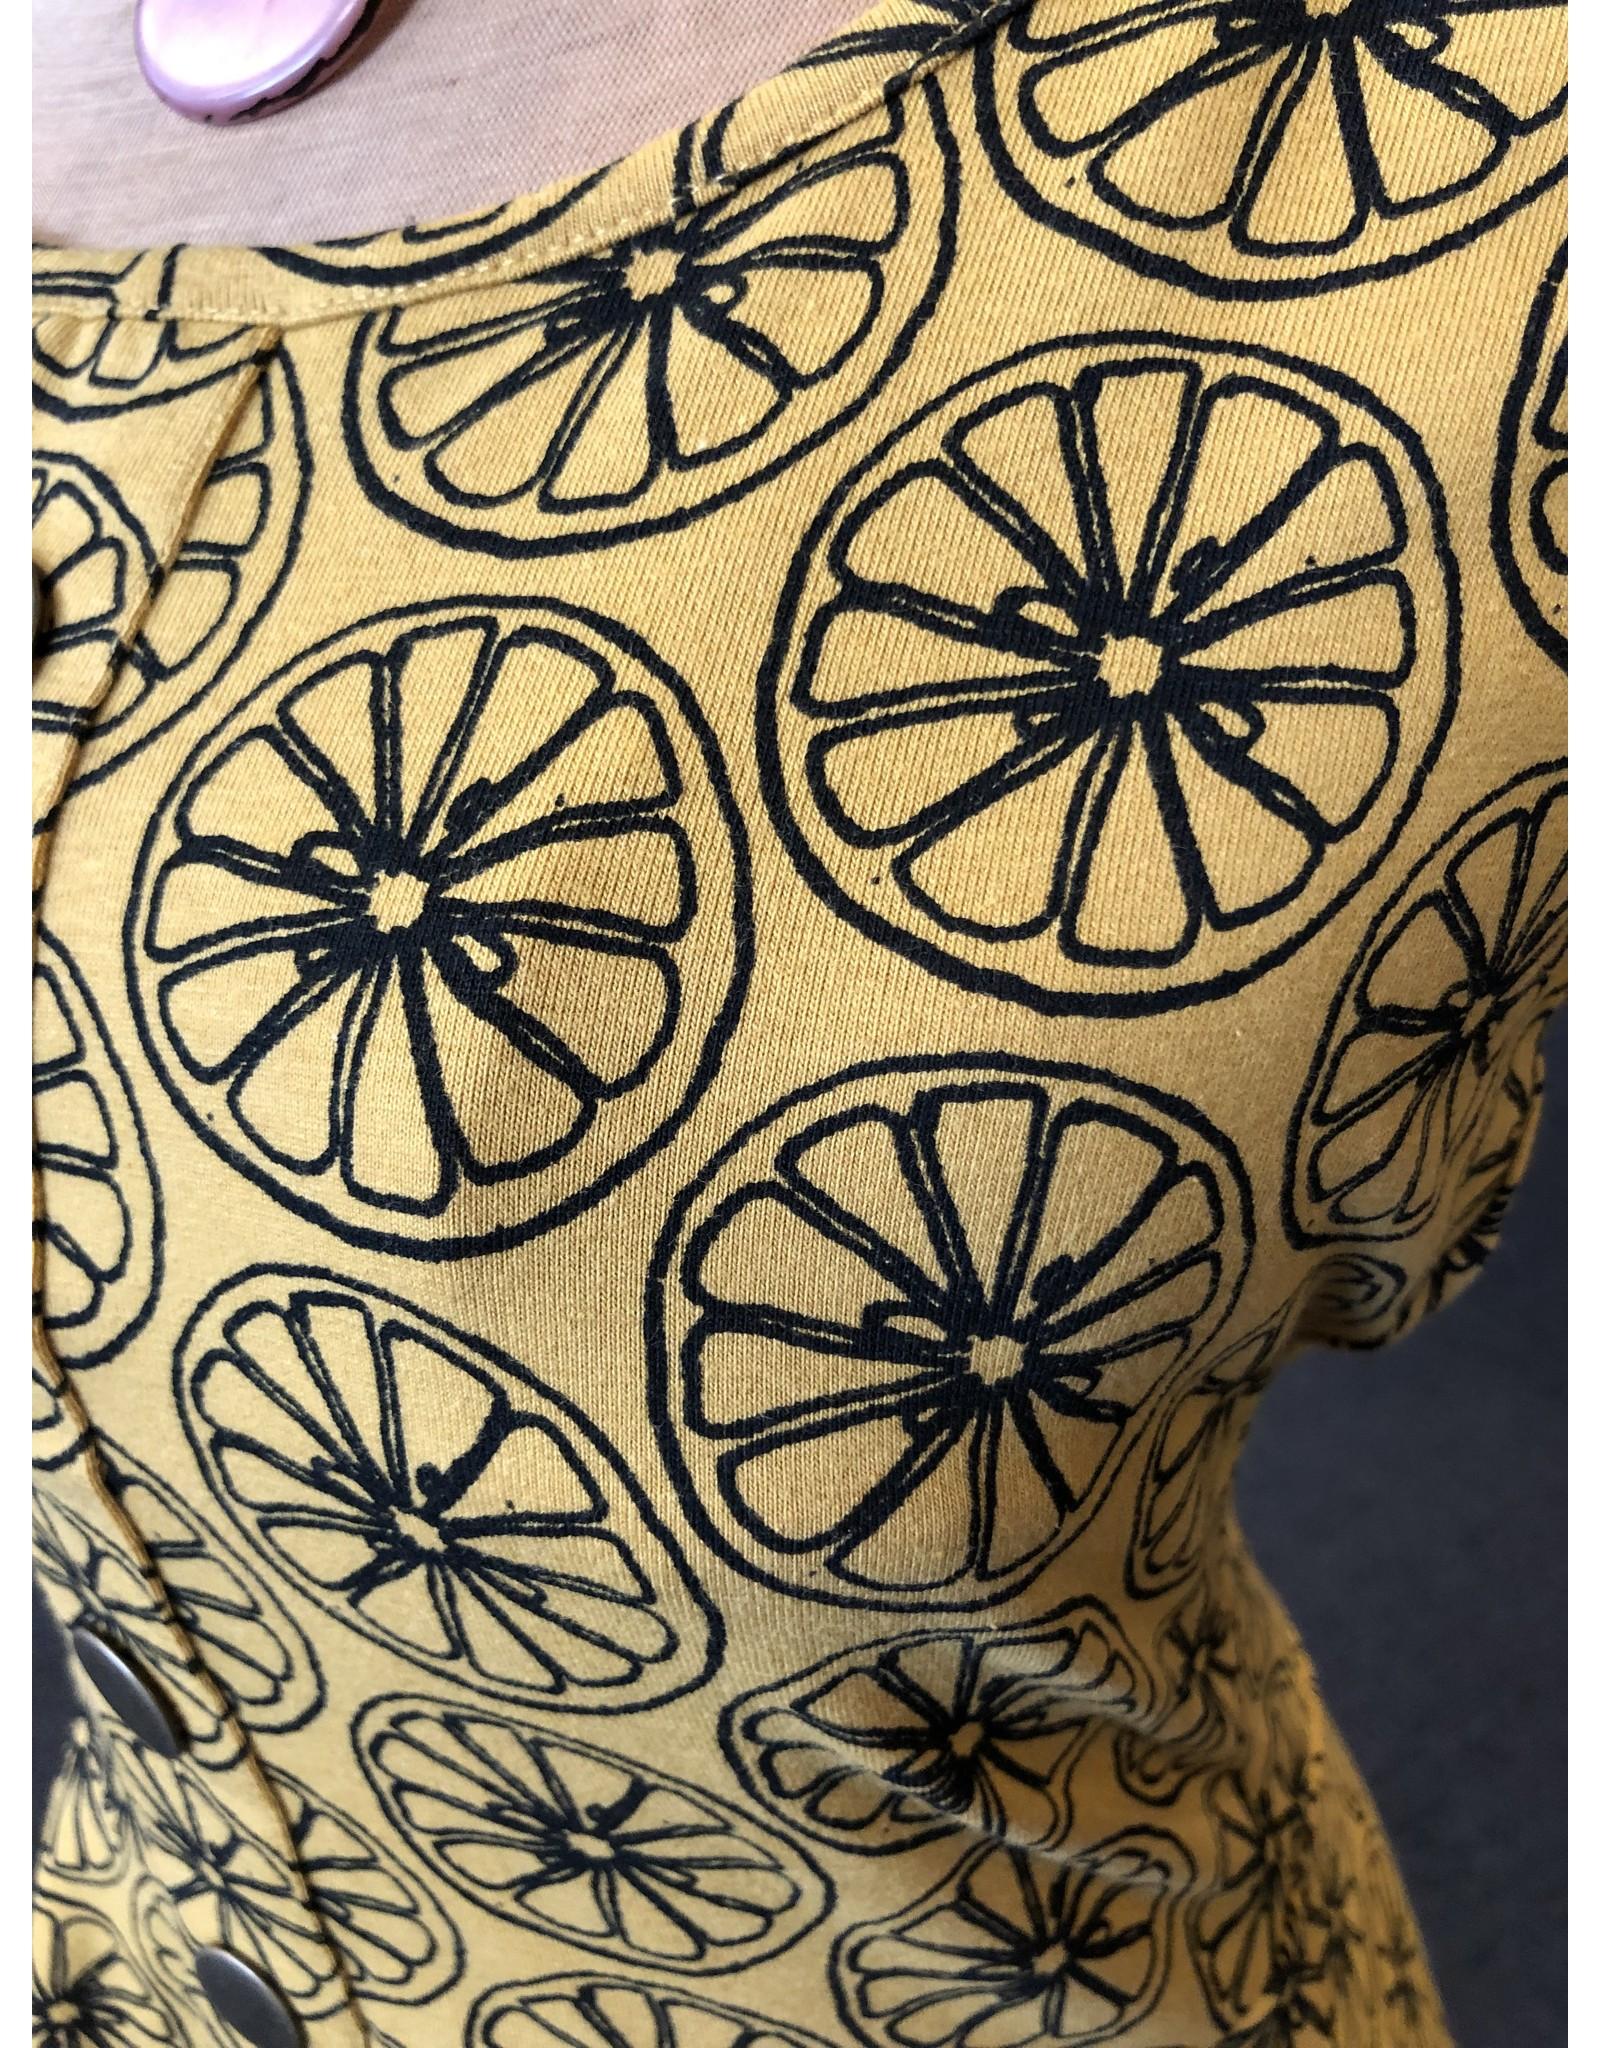 Effie's Heart Hemingway Dress